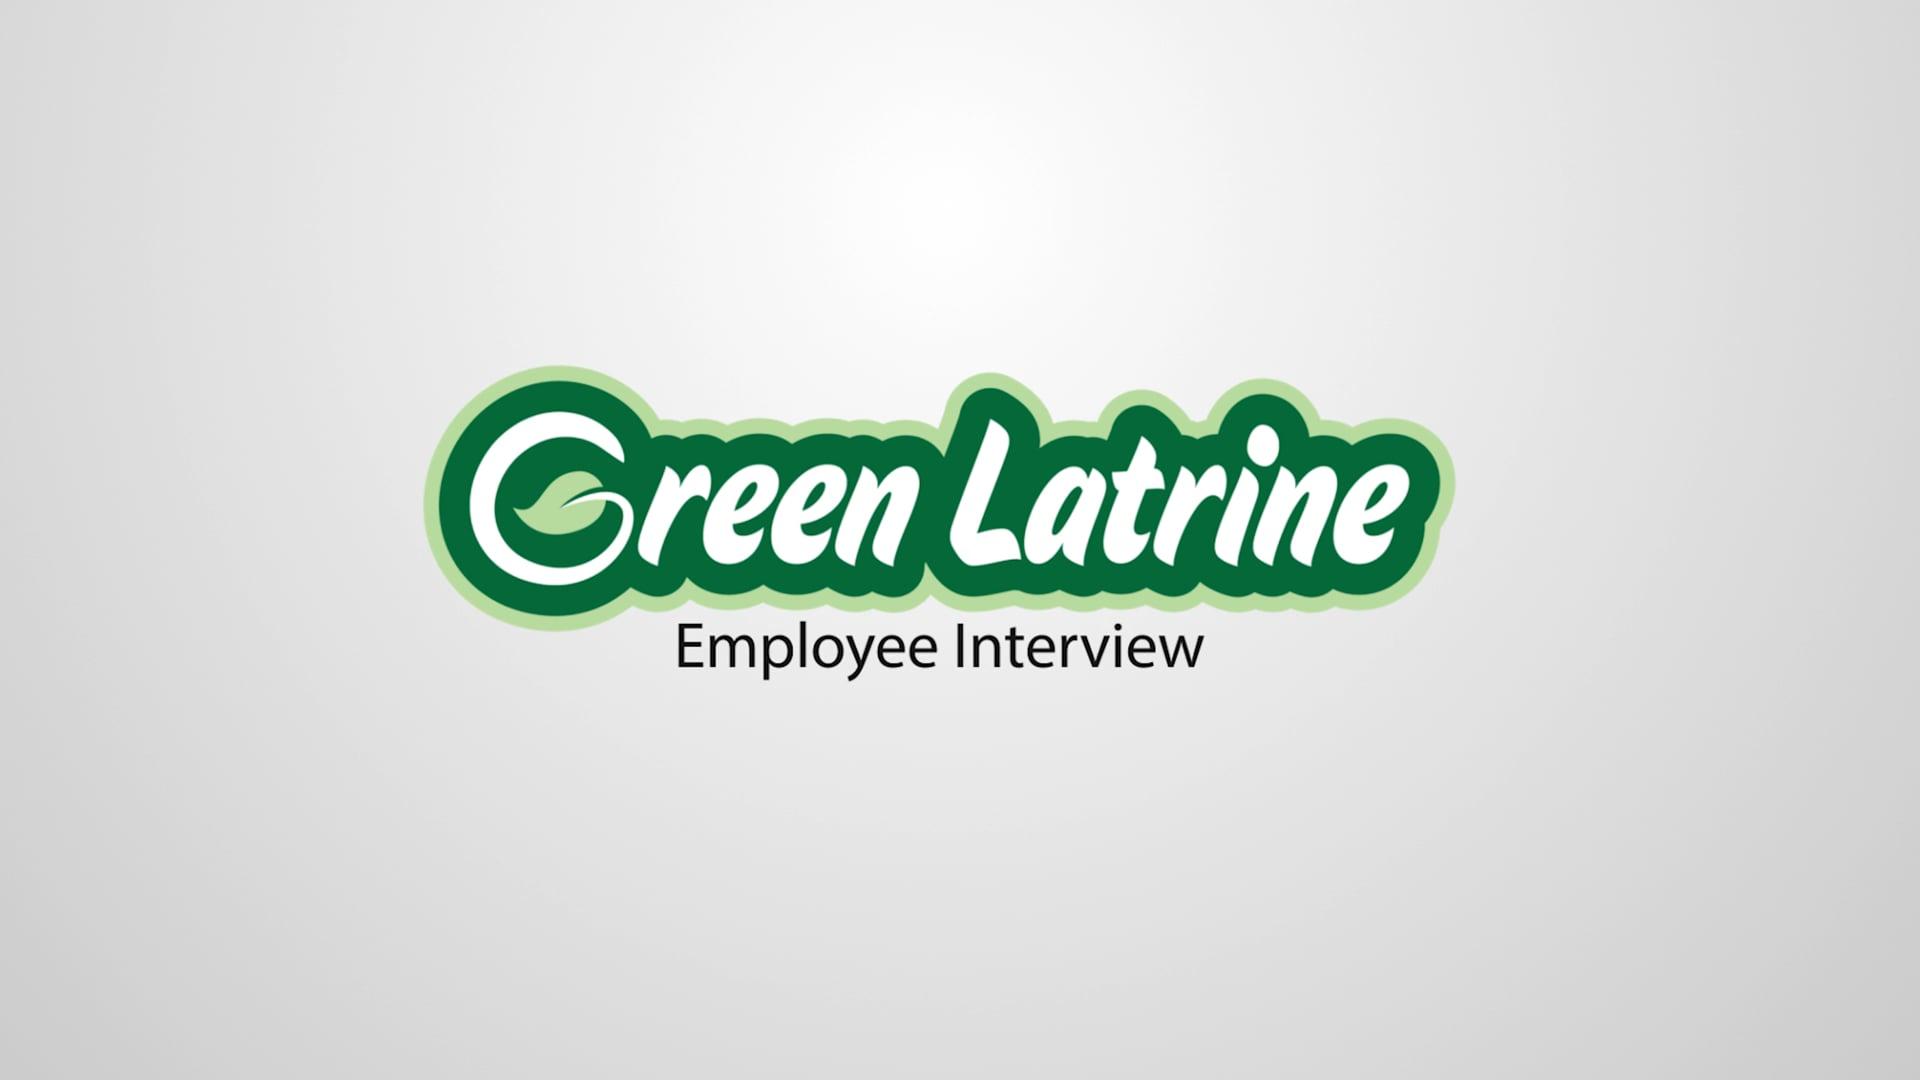 Green Latrine Interviews | Will Niccolls